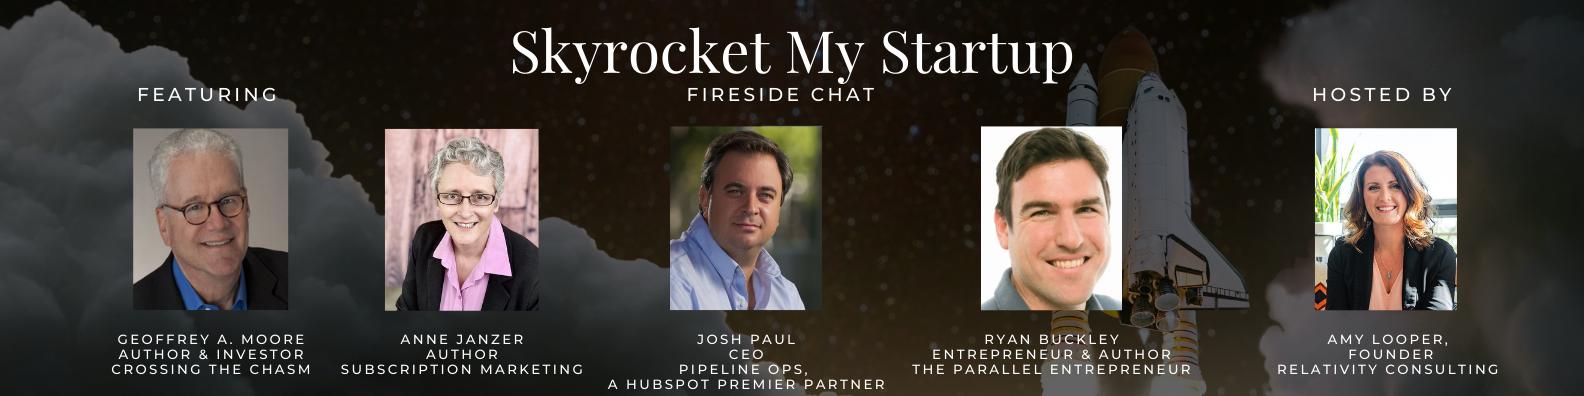 skyrocket-my-startup